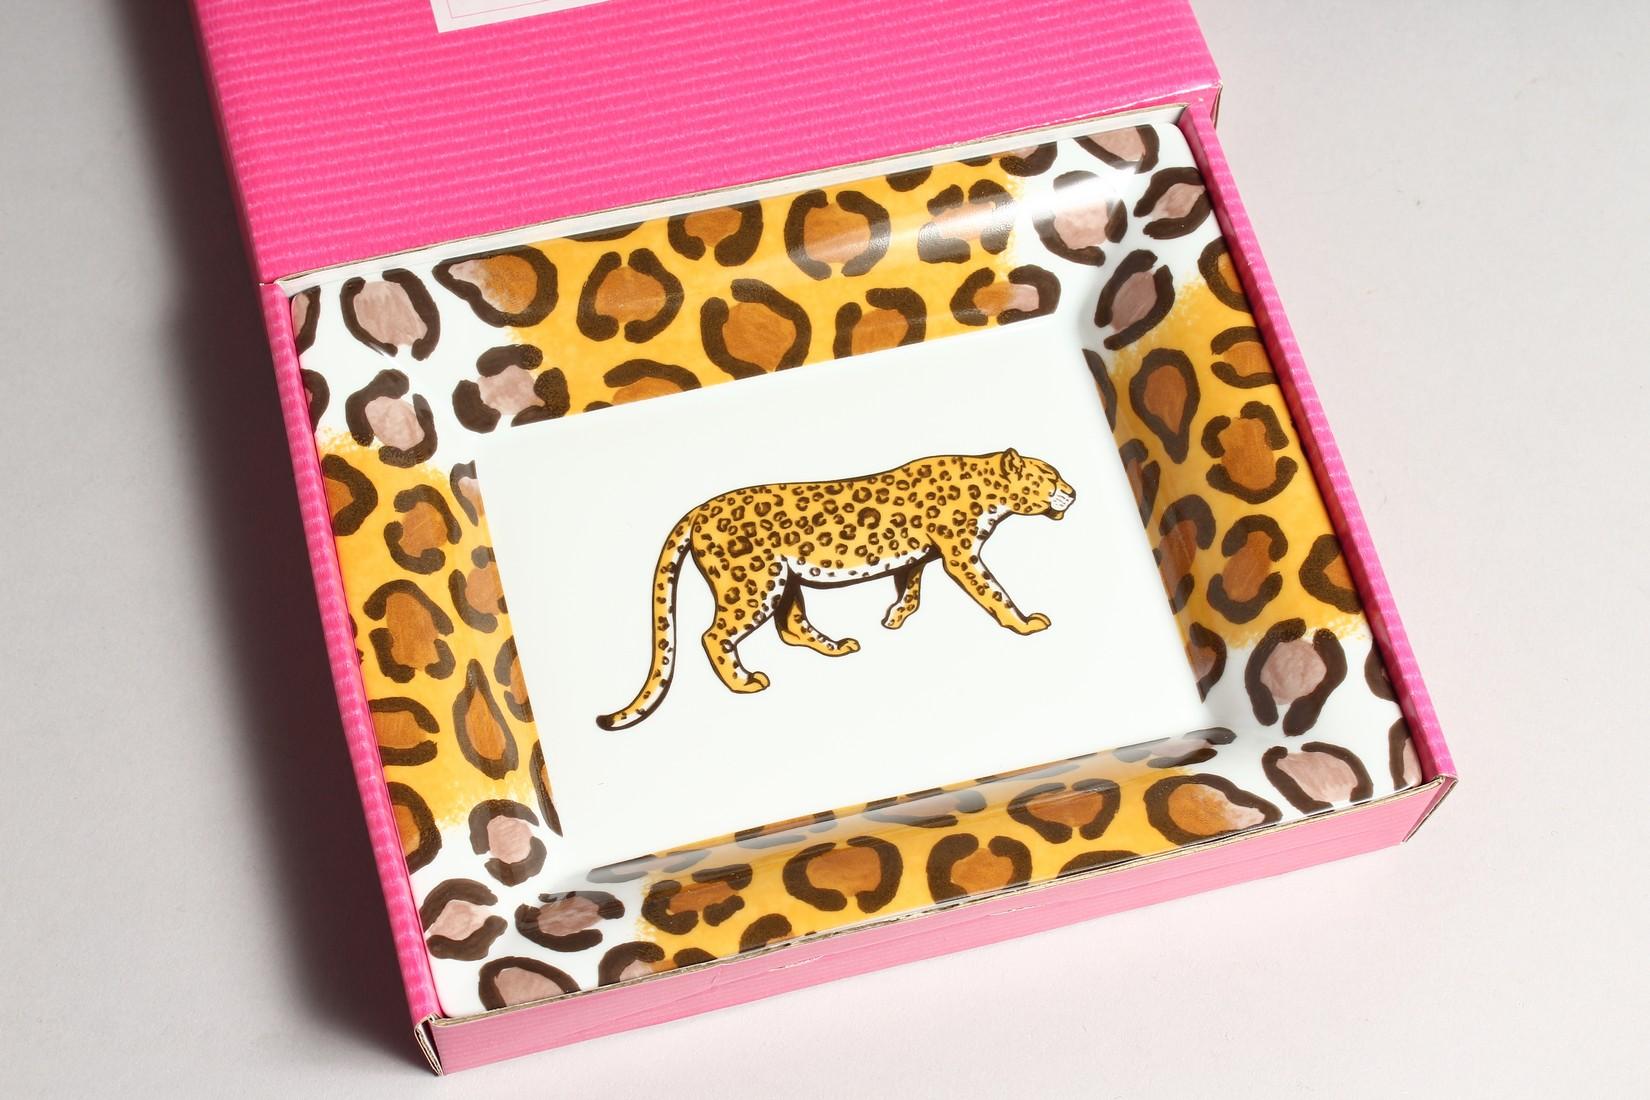 A PATRICIA DEROUBAIX LEMOGE LEOPARD ASH TRAY in a box. - Image 2 of 3